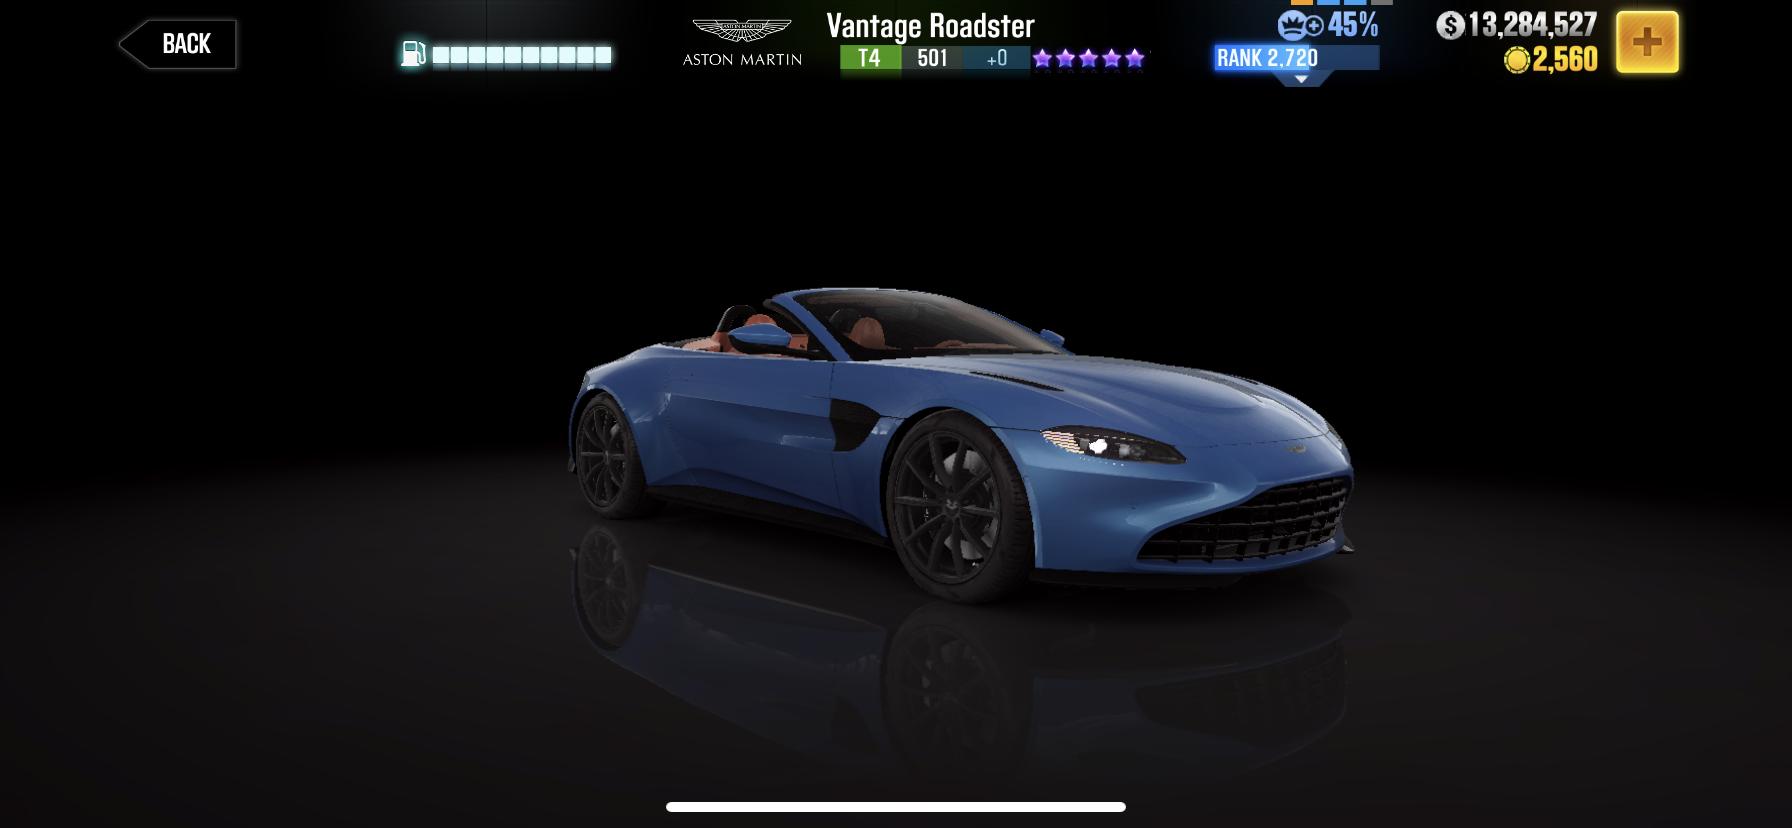 Aston Martin Vantage Roadster Csr Racing Wiki Fandom